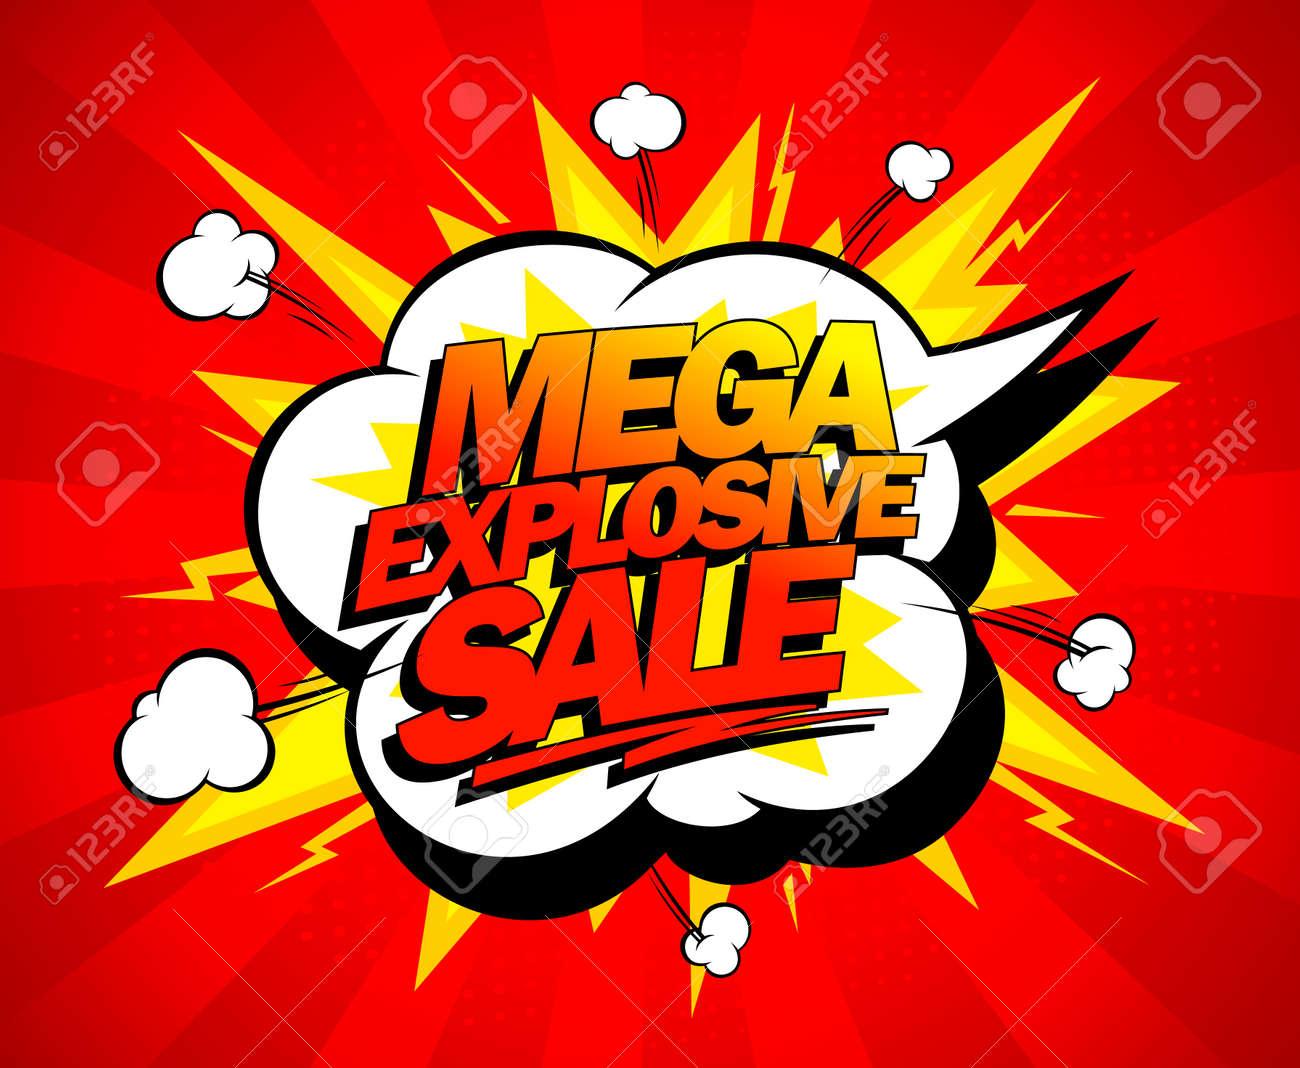 Mega explosive sale design, comics style. Stock Vector - 25941187